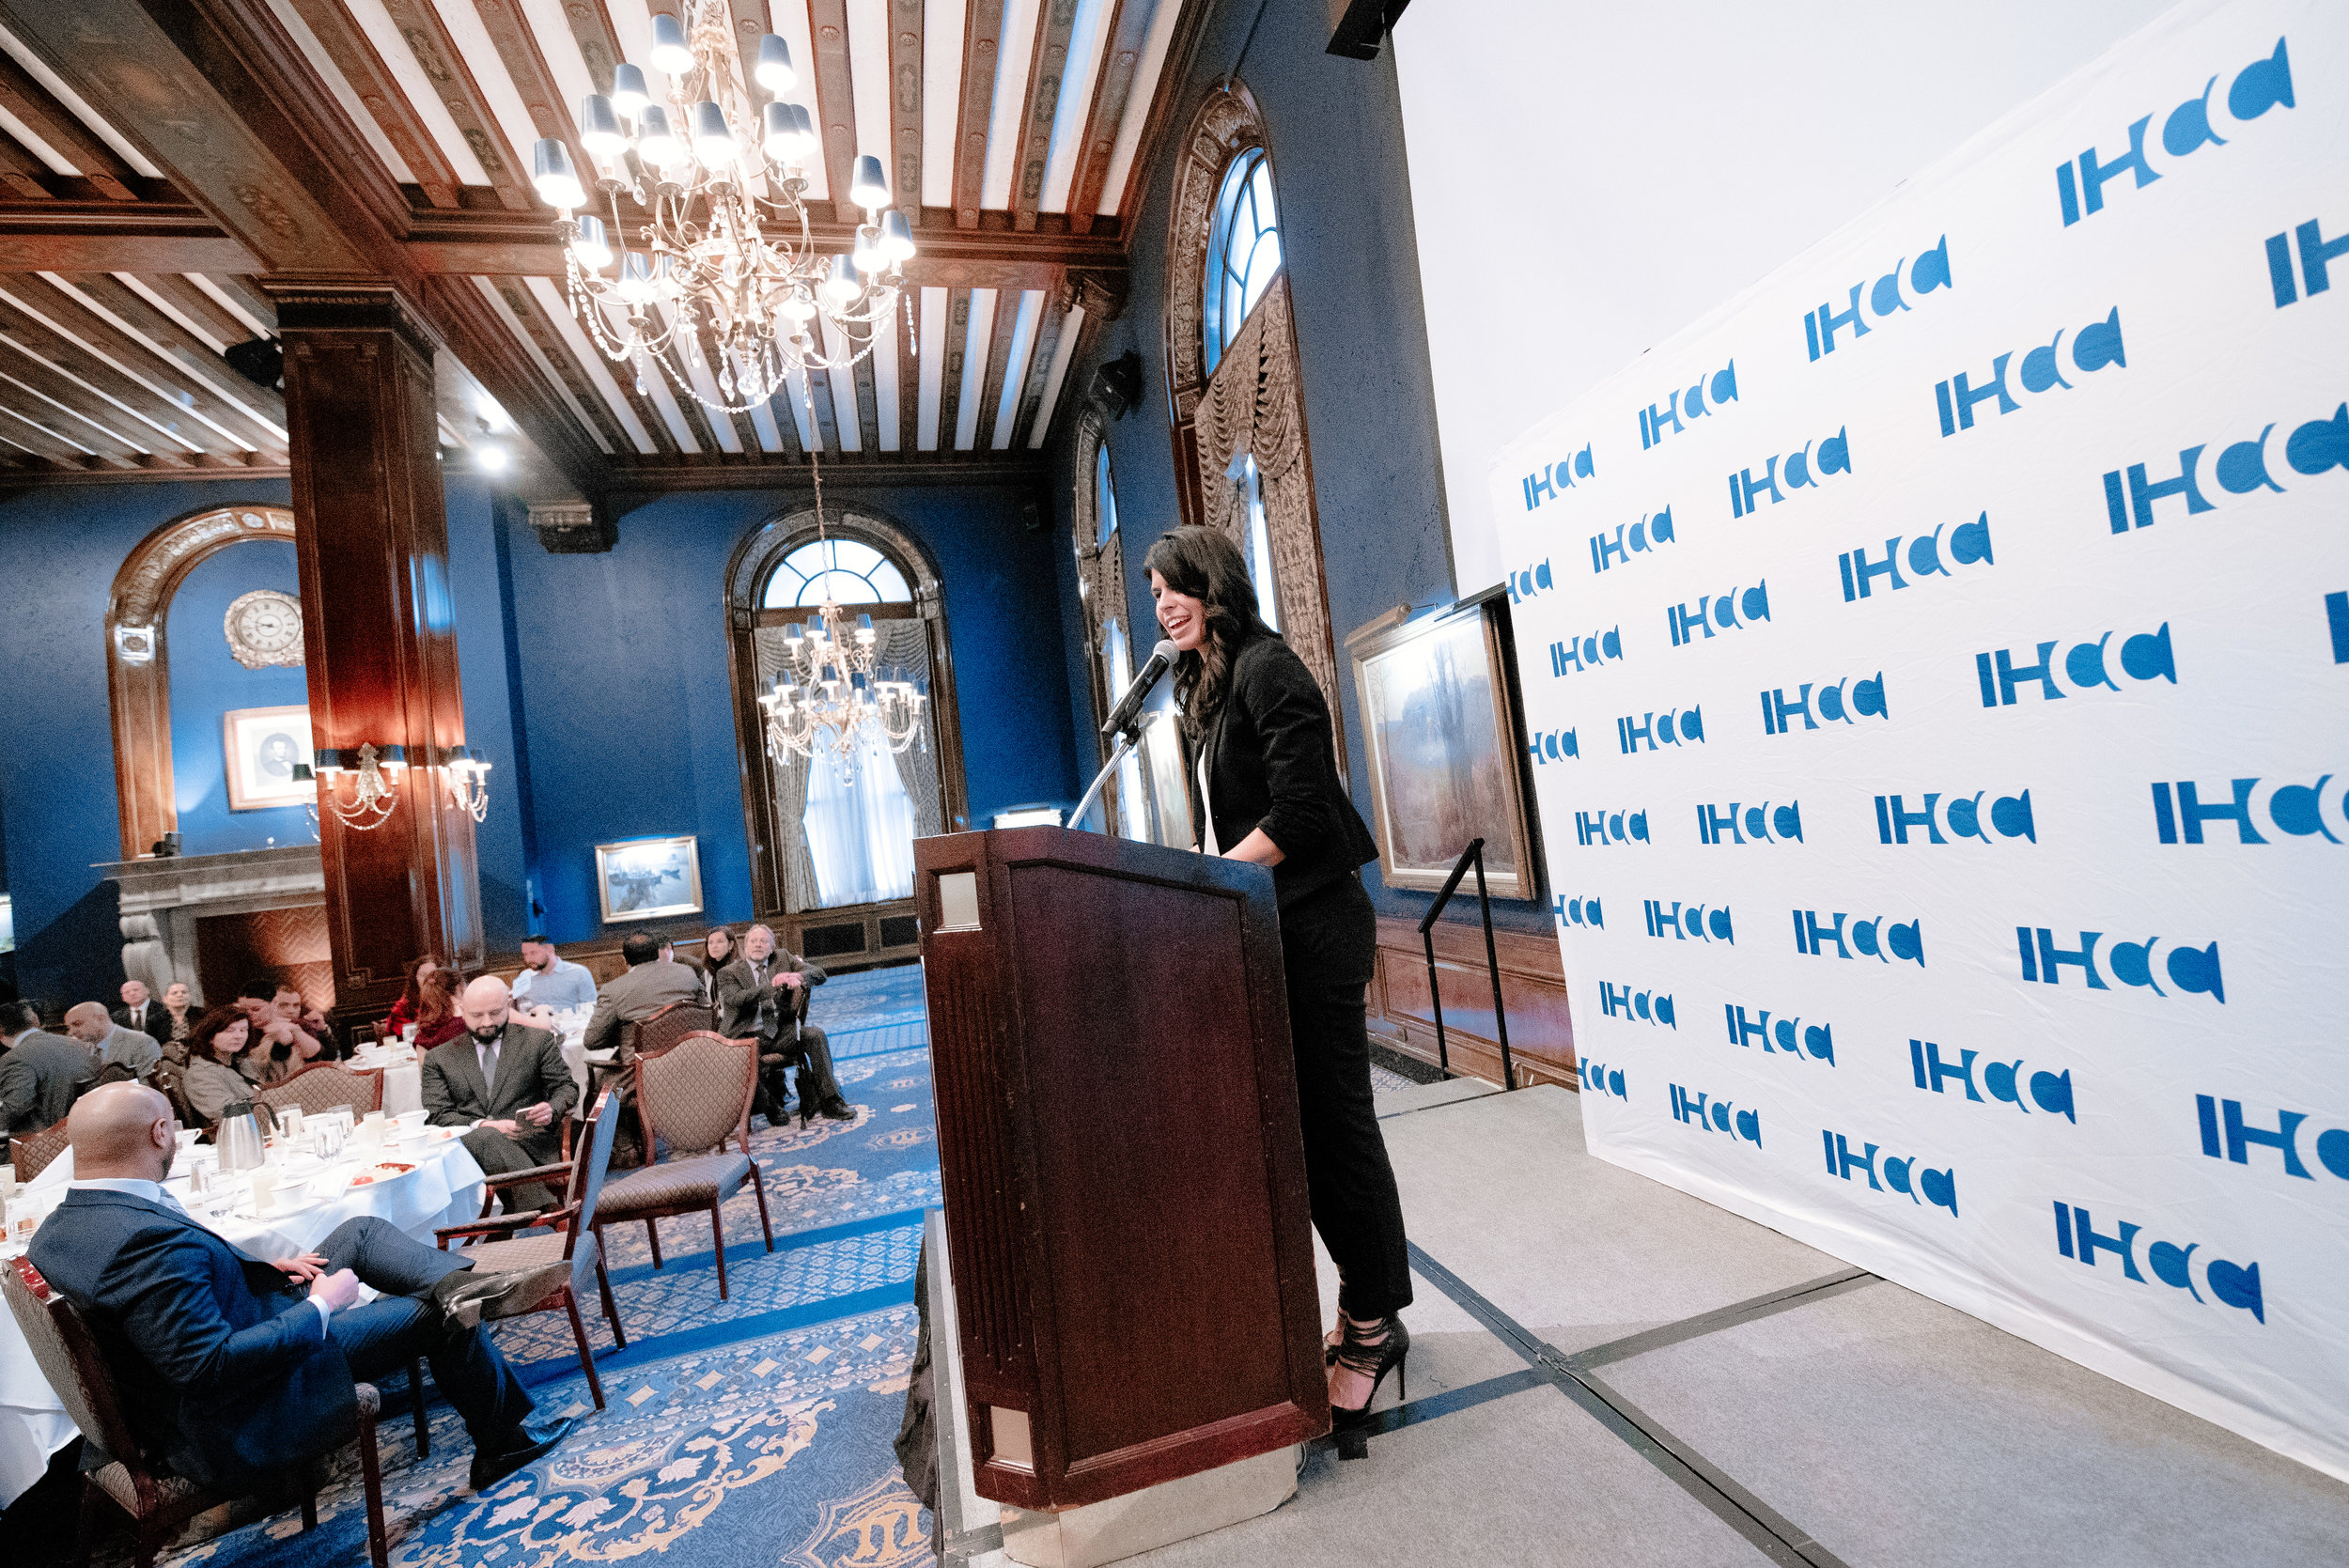 IHCC program director Liana Bran at an IHCC Breakfast Meeting